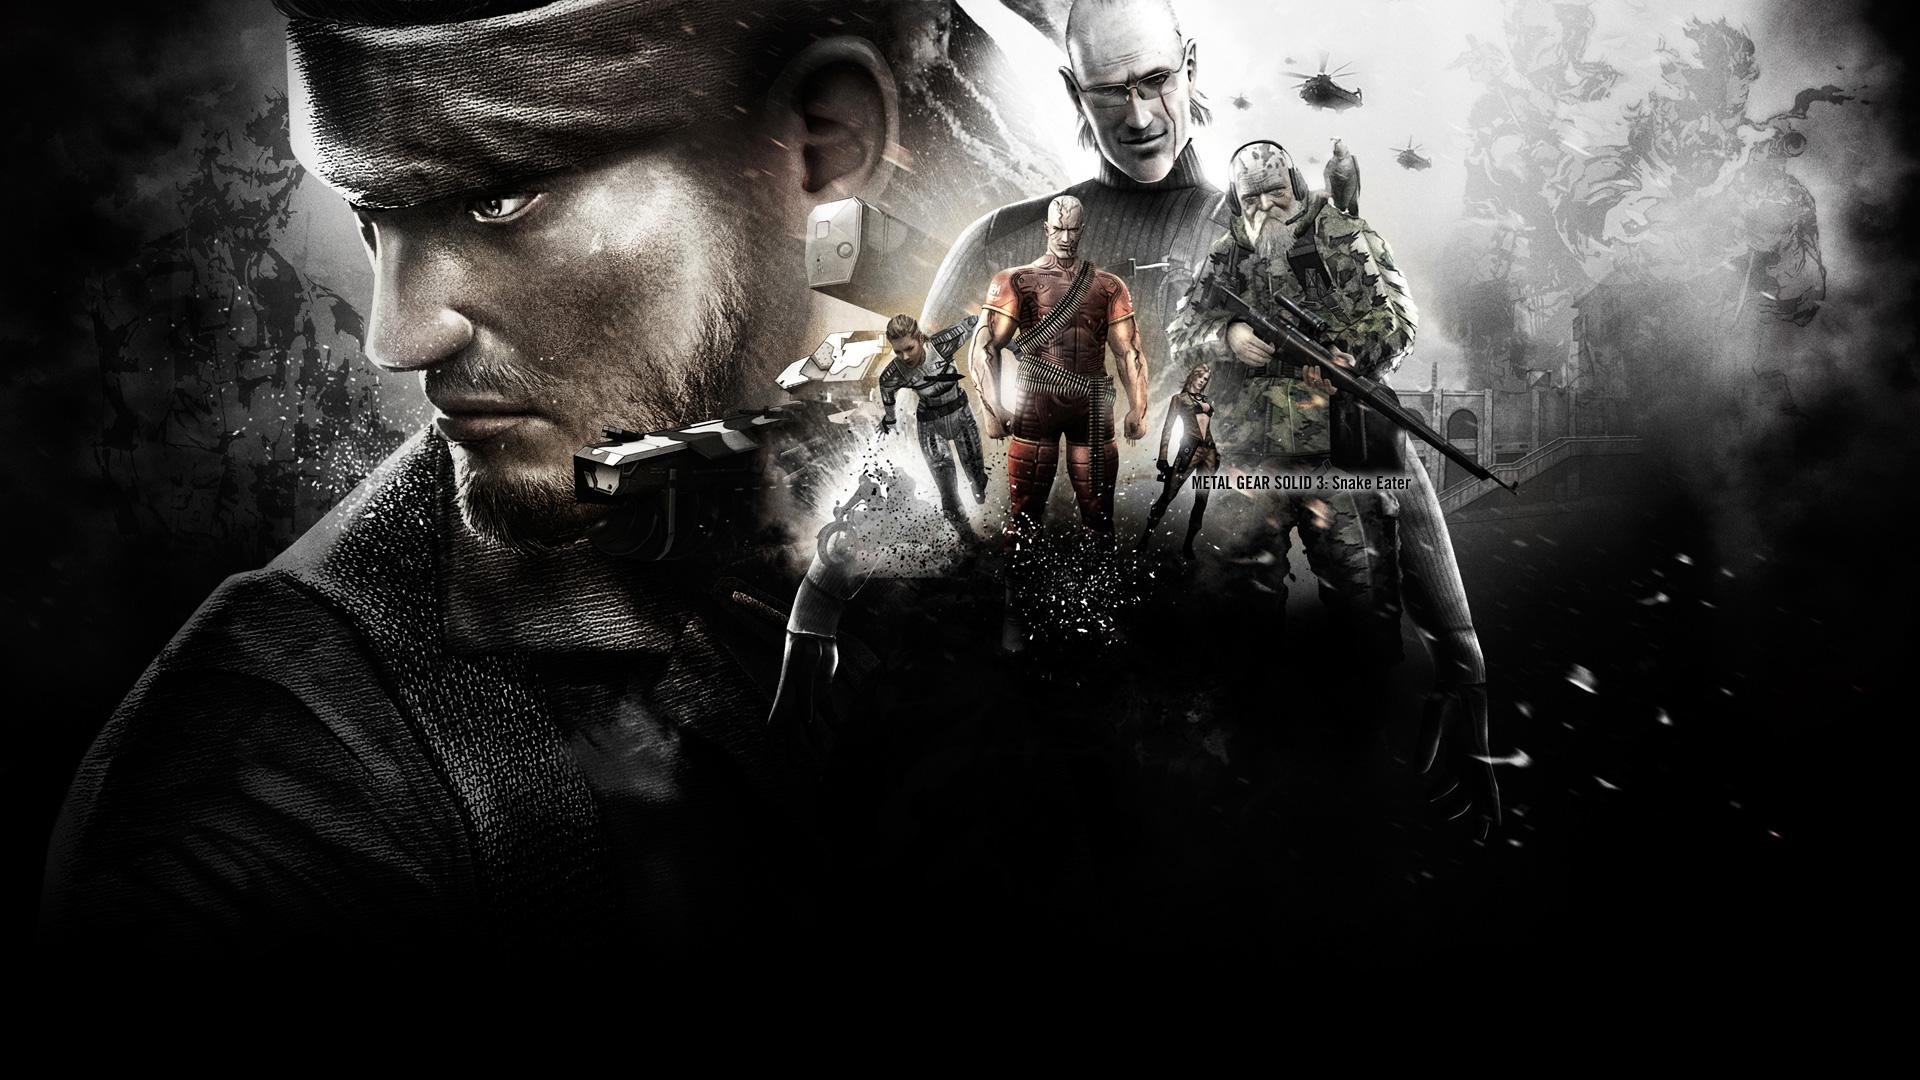 Free Download Big Boss Metal Gear 5 Wallpaper 257515